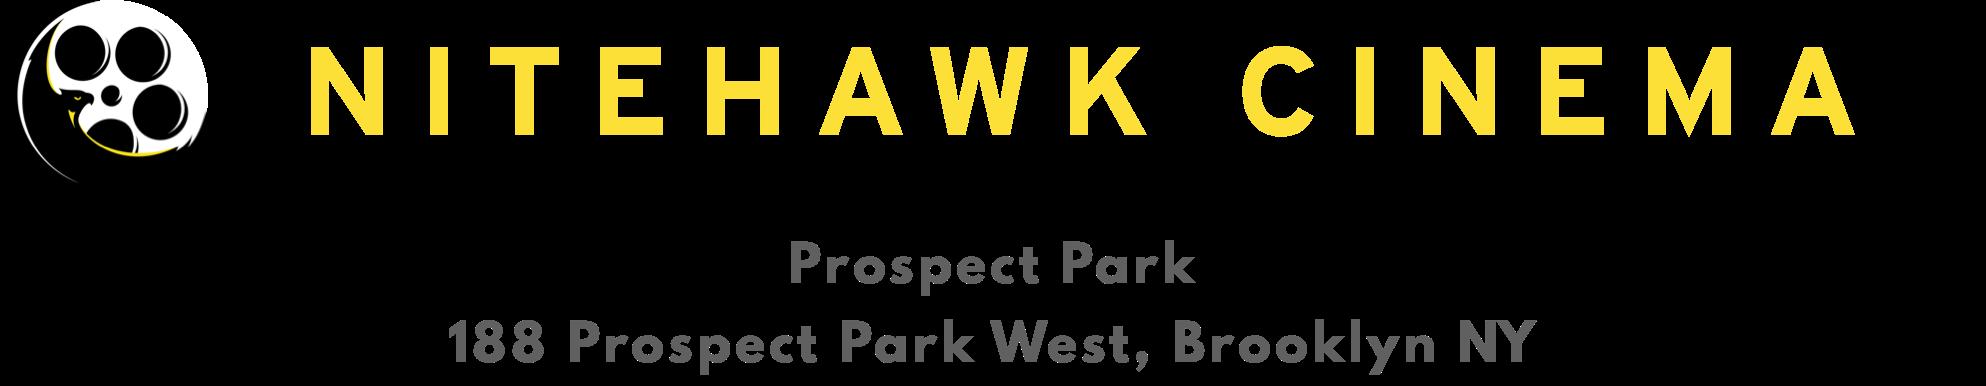 Nitehawk Cinema – Prospect Park